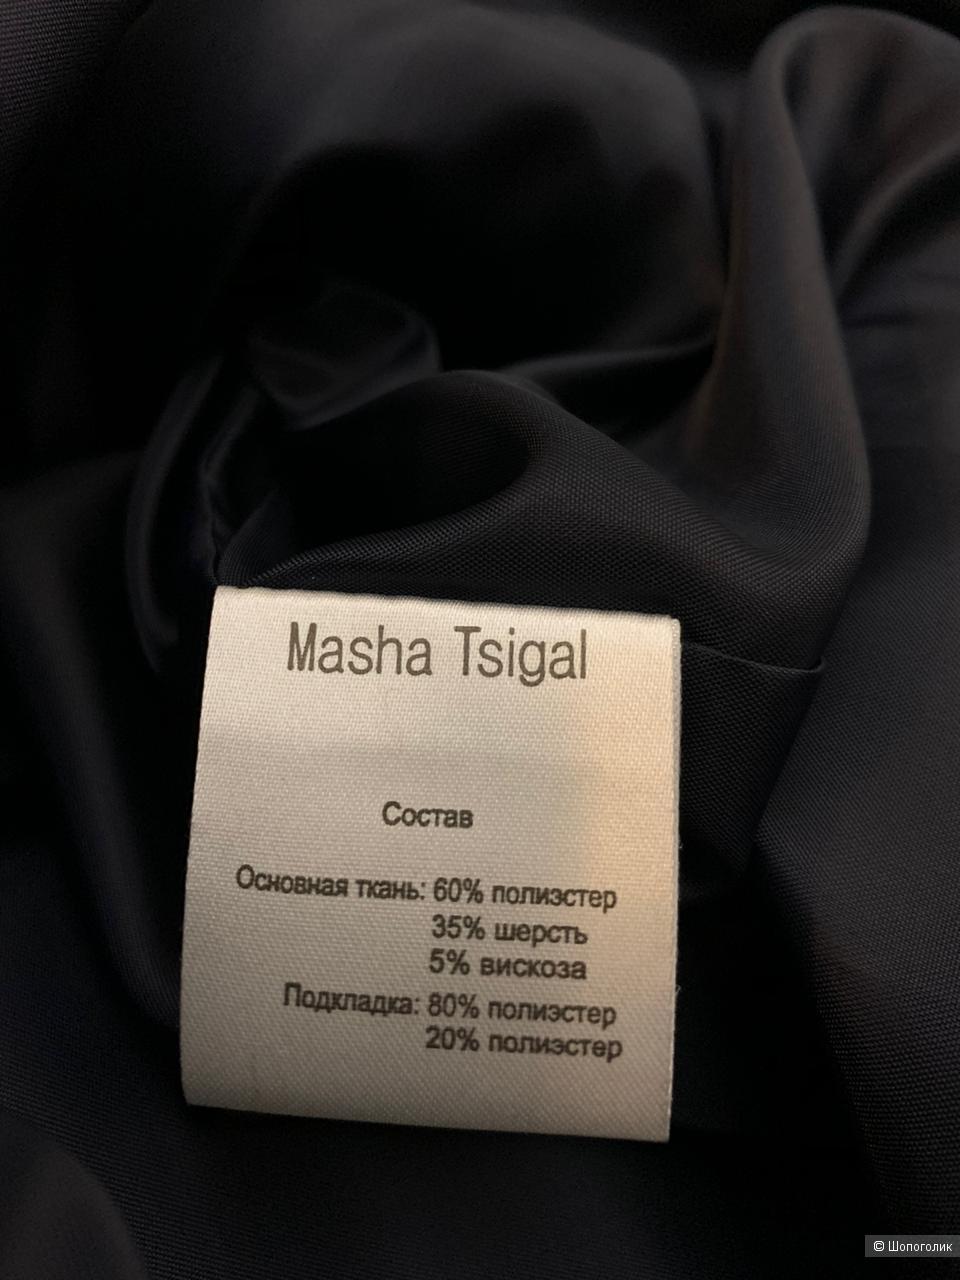 Masha tsigal пальто М